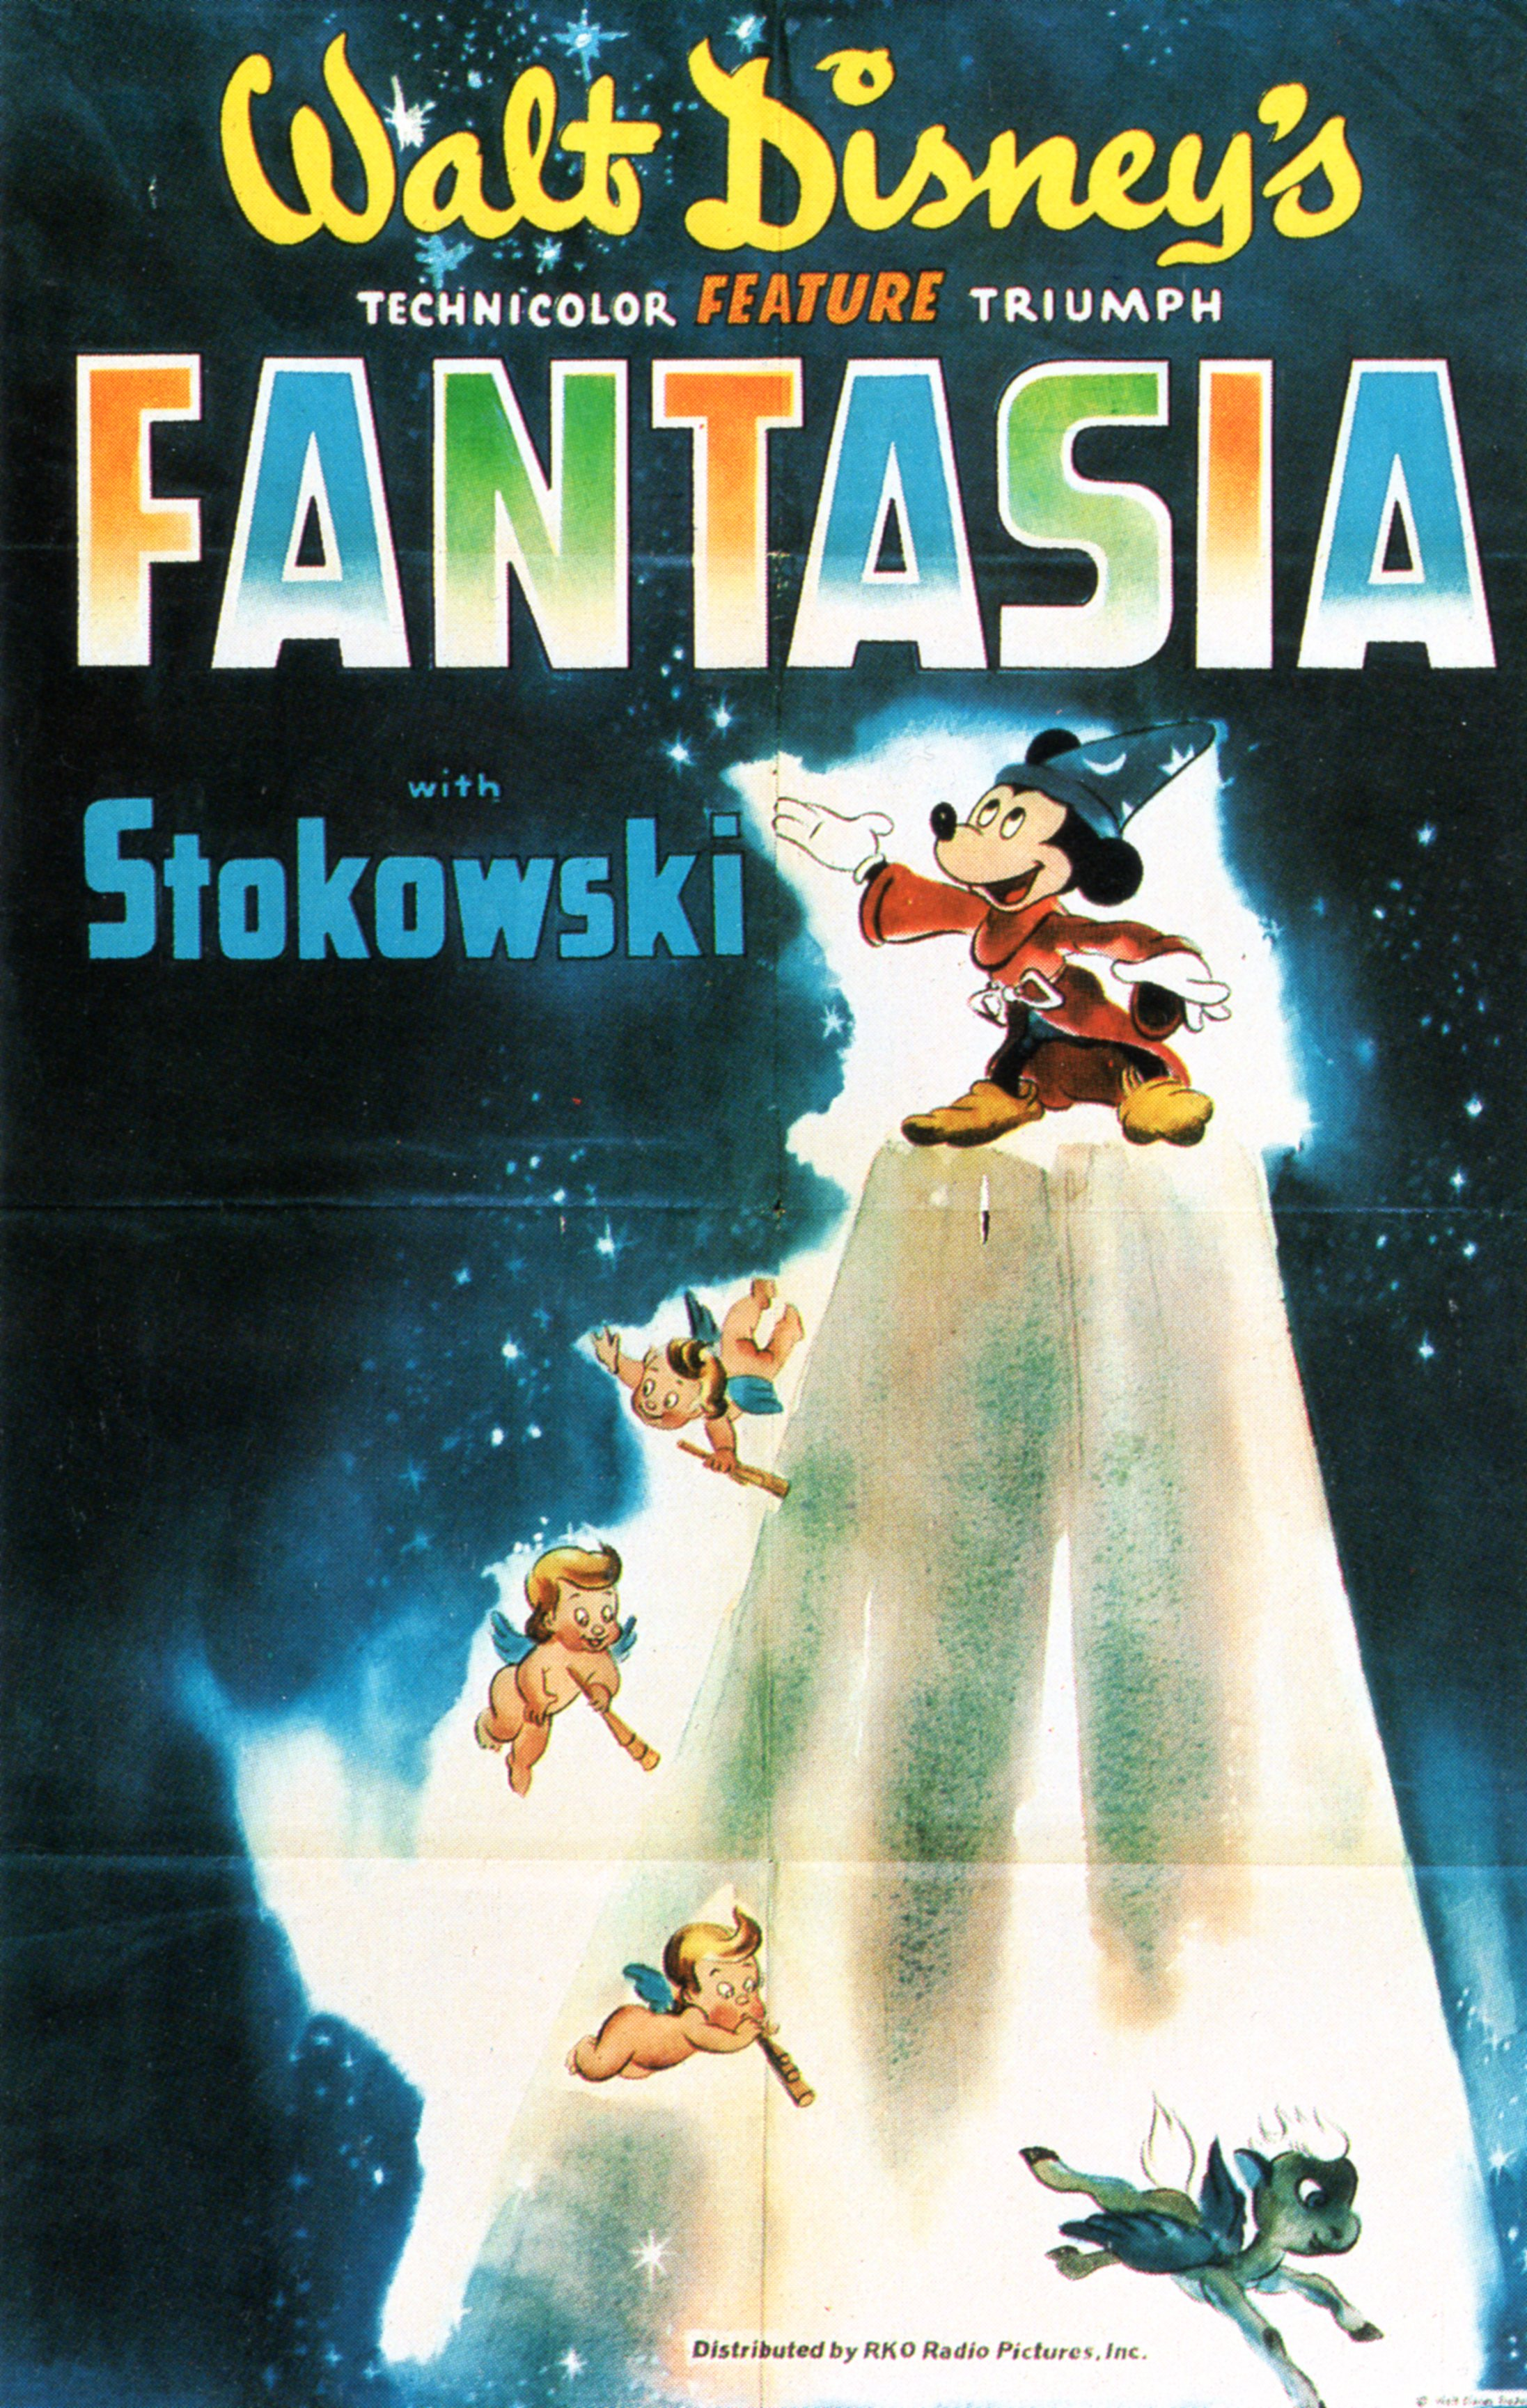 Fantasia (long métrage)